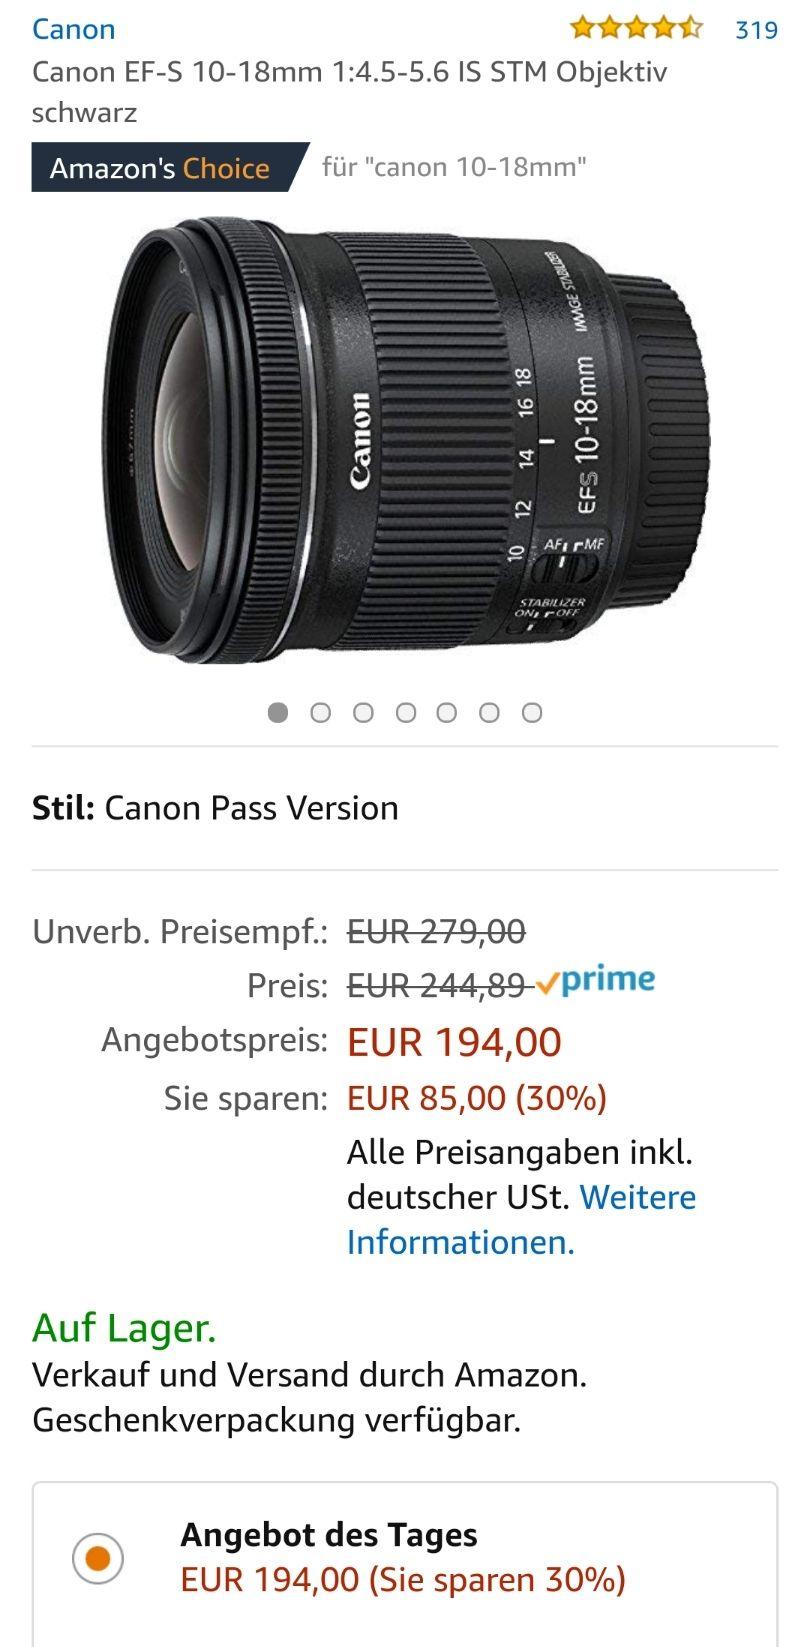 [Primeday] Canon EF-S 10-18mm 1:4.5-5.6 IS STM Objektiv schwarz